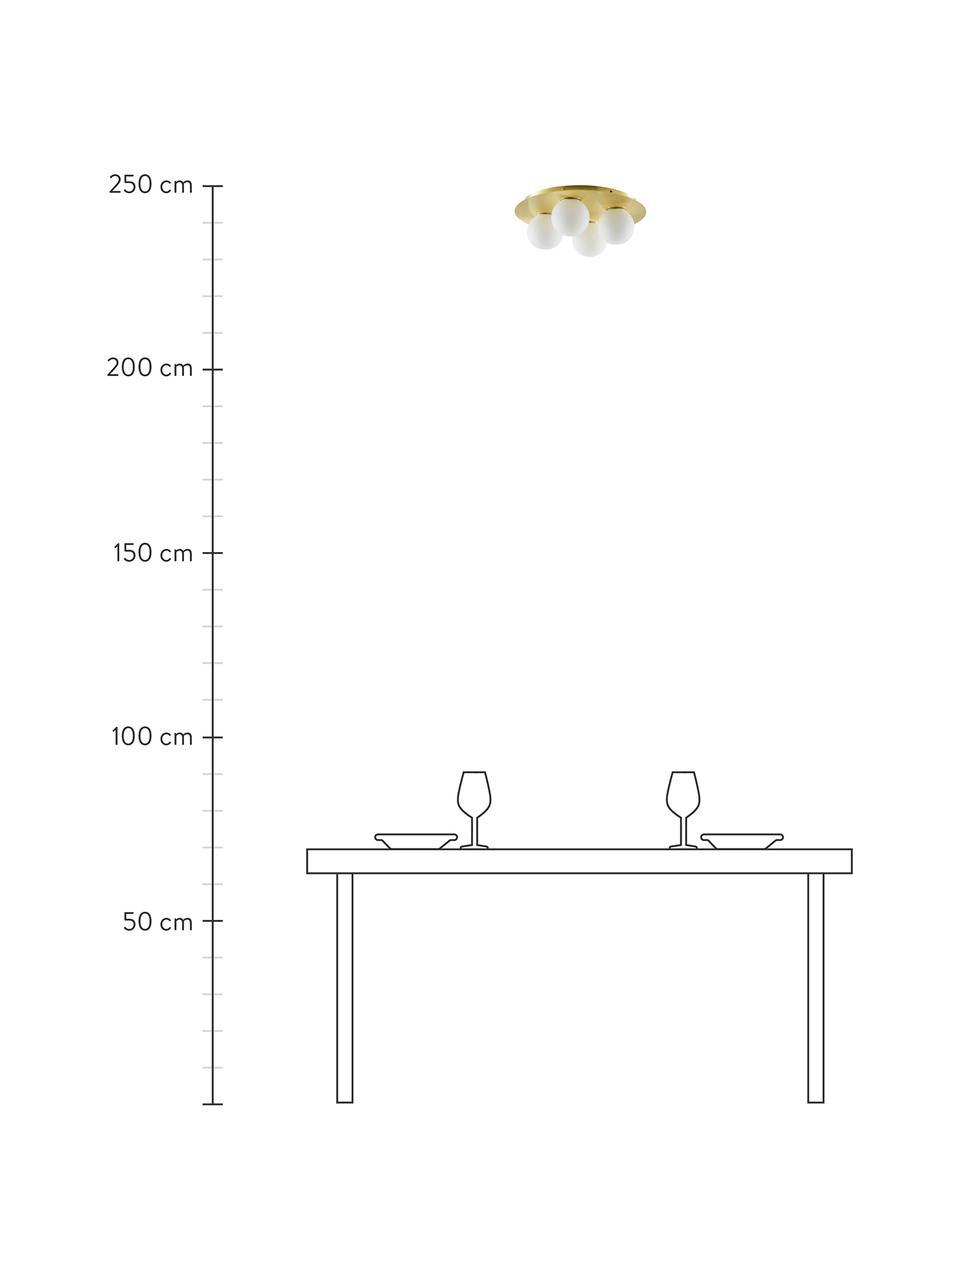 Plafoniera da parete e soffitto dorata Hitch, Baldacchino: metallo ottonato, Paralume: vetro, Baldacchino e rilegatura: ottone opaco Paralume: bianco, Ø 36 x Alt. 12 cm